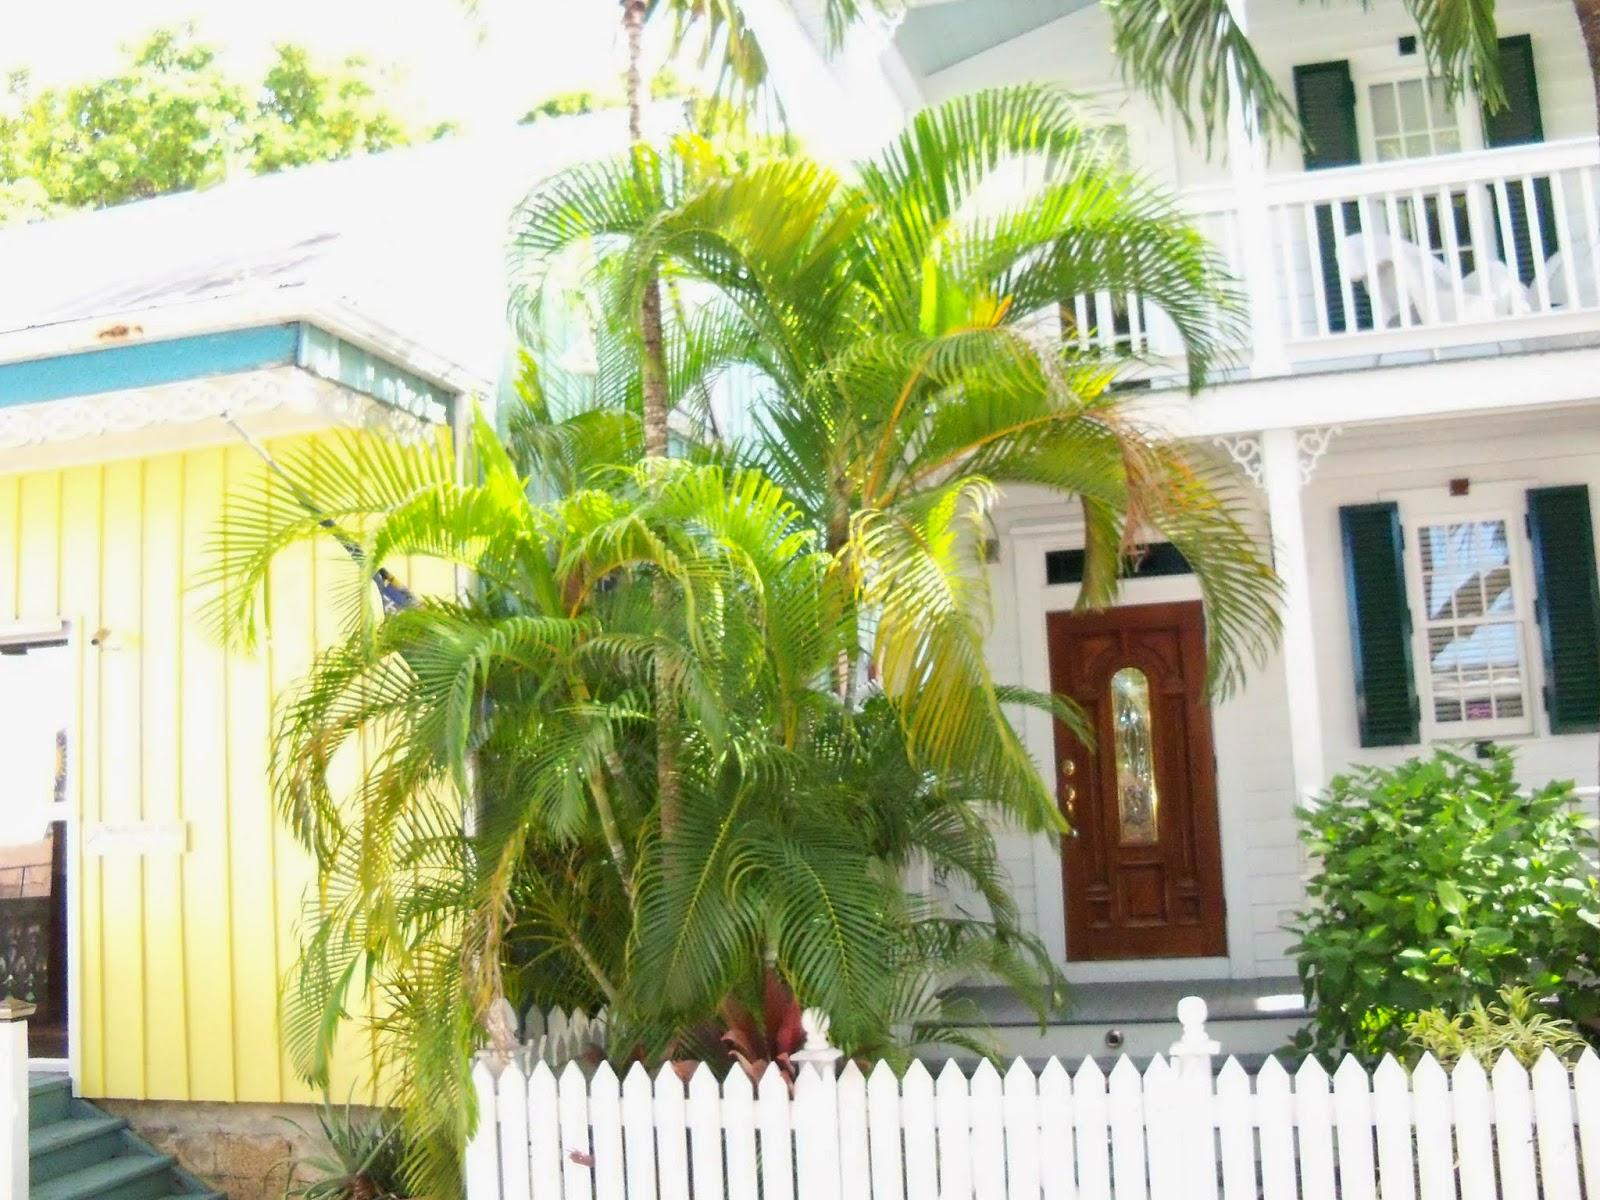 Key West Vacation - 116_5640.JPG